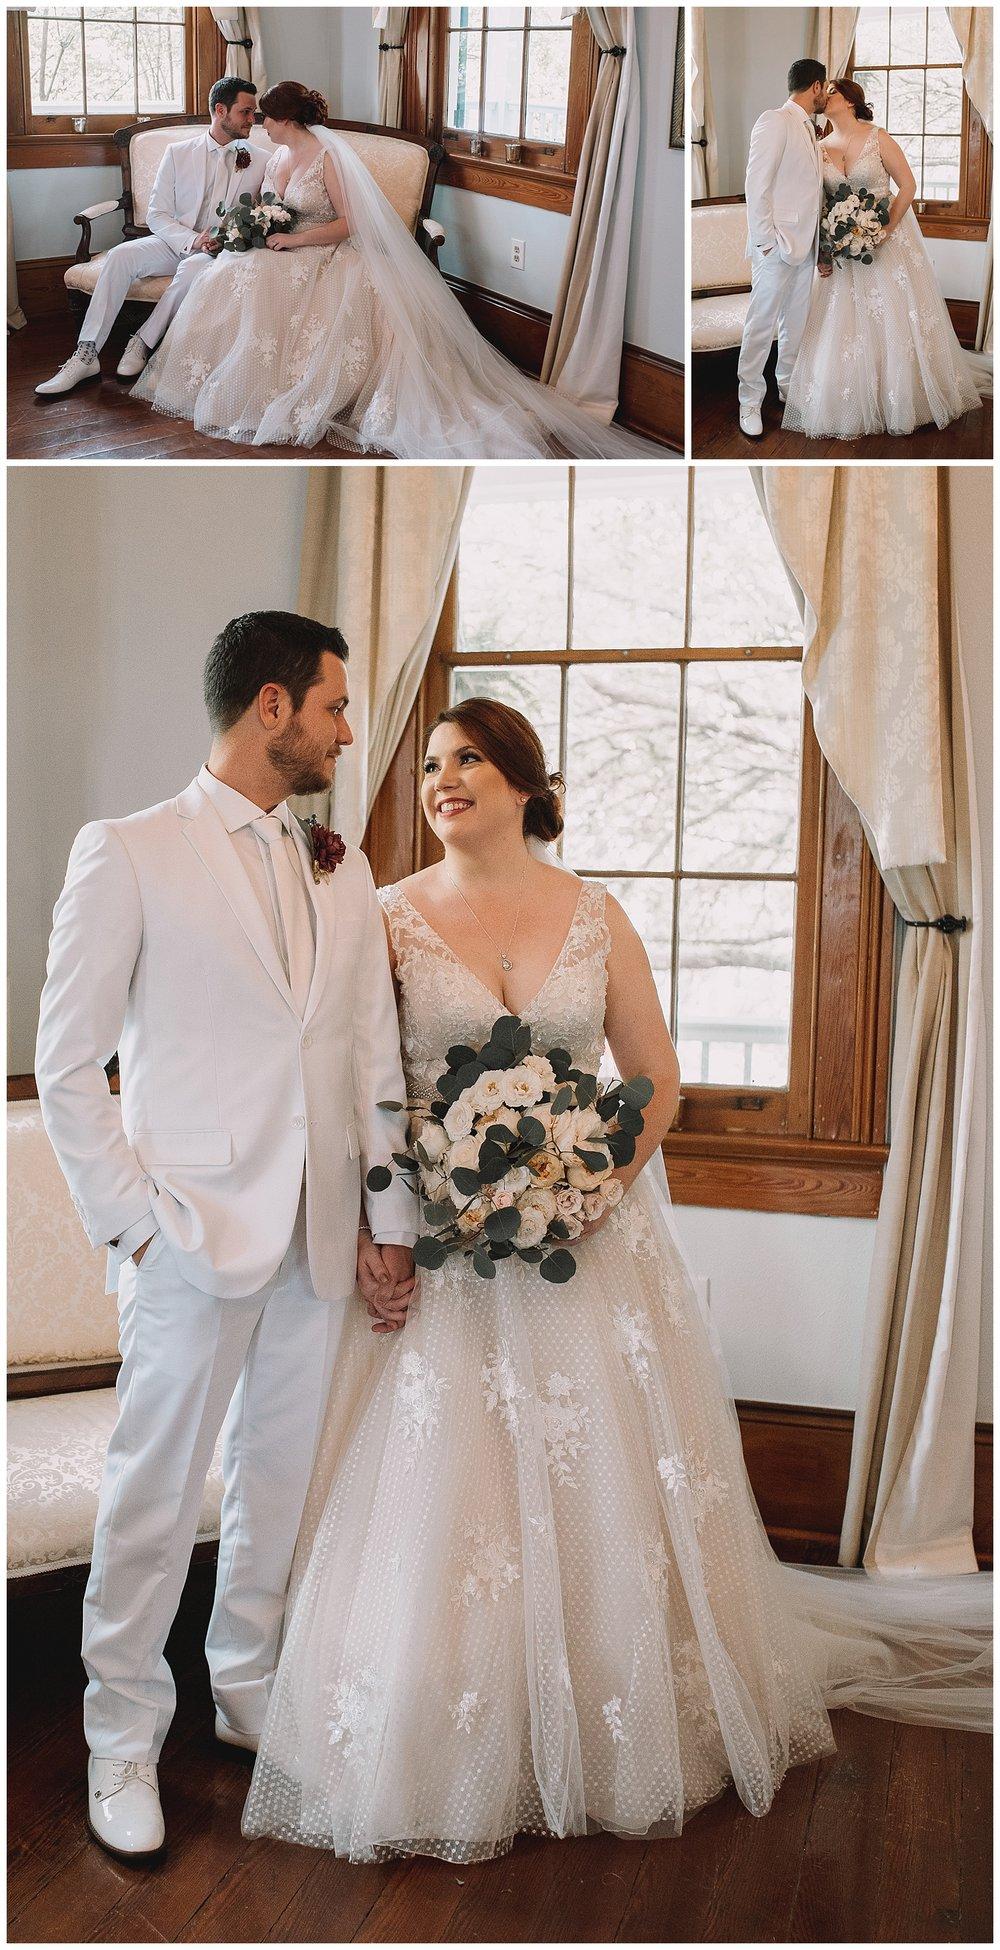 Grace and James Wedding - Compass Point Events - Kallistia Photography_0010.jpg